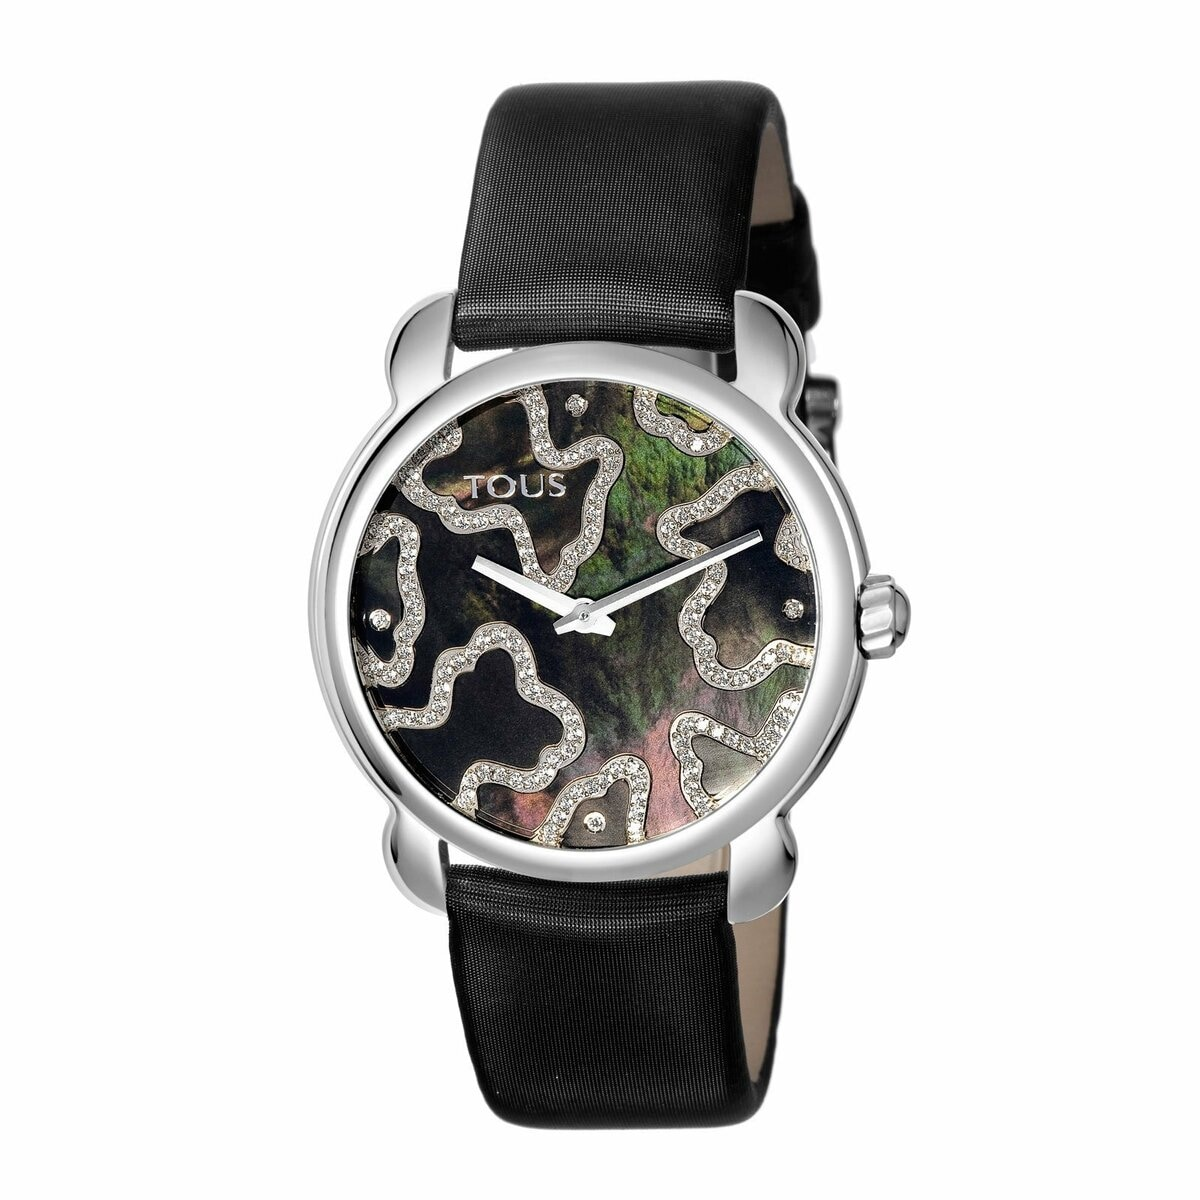 Steel Kaos Slim Watch with Diamonds and black Satin strap